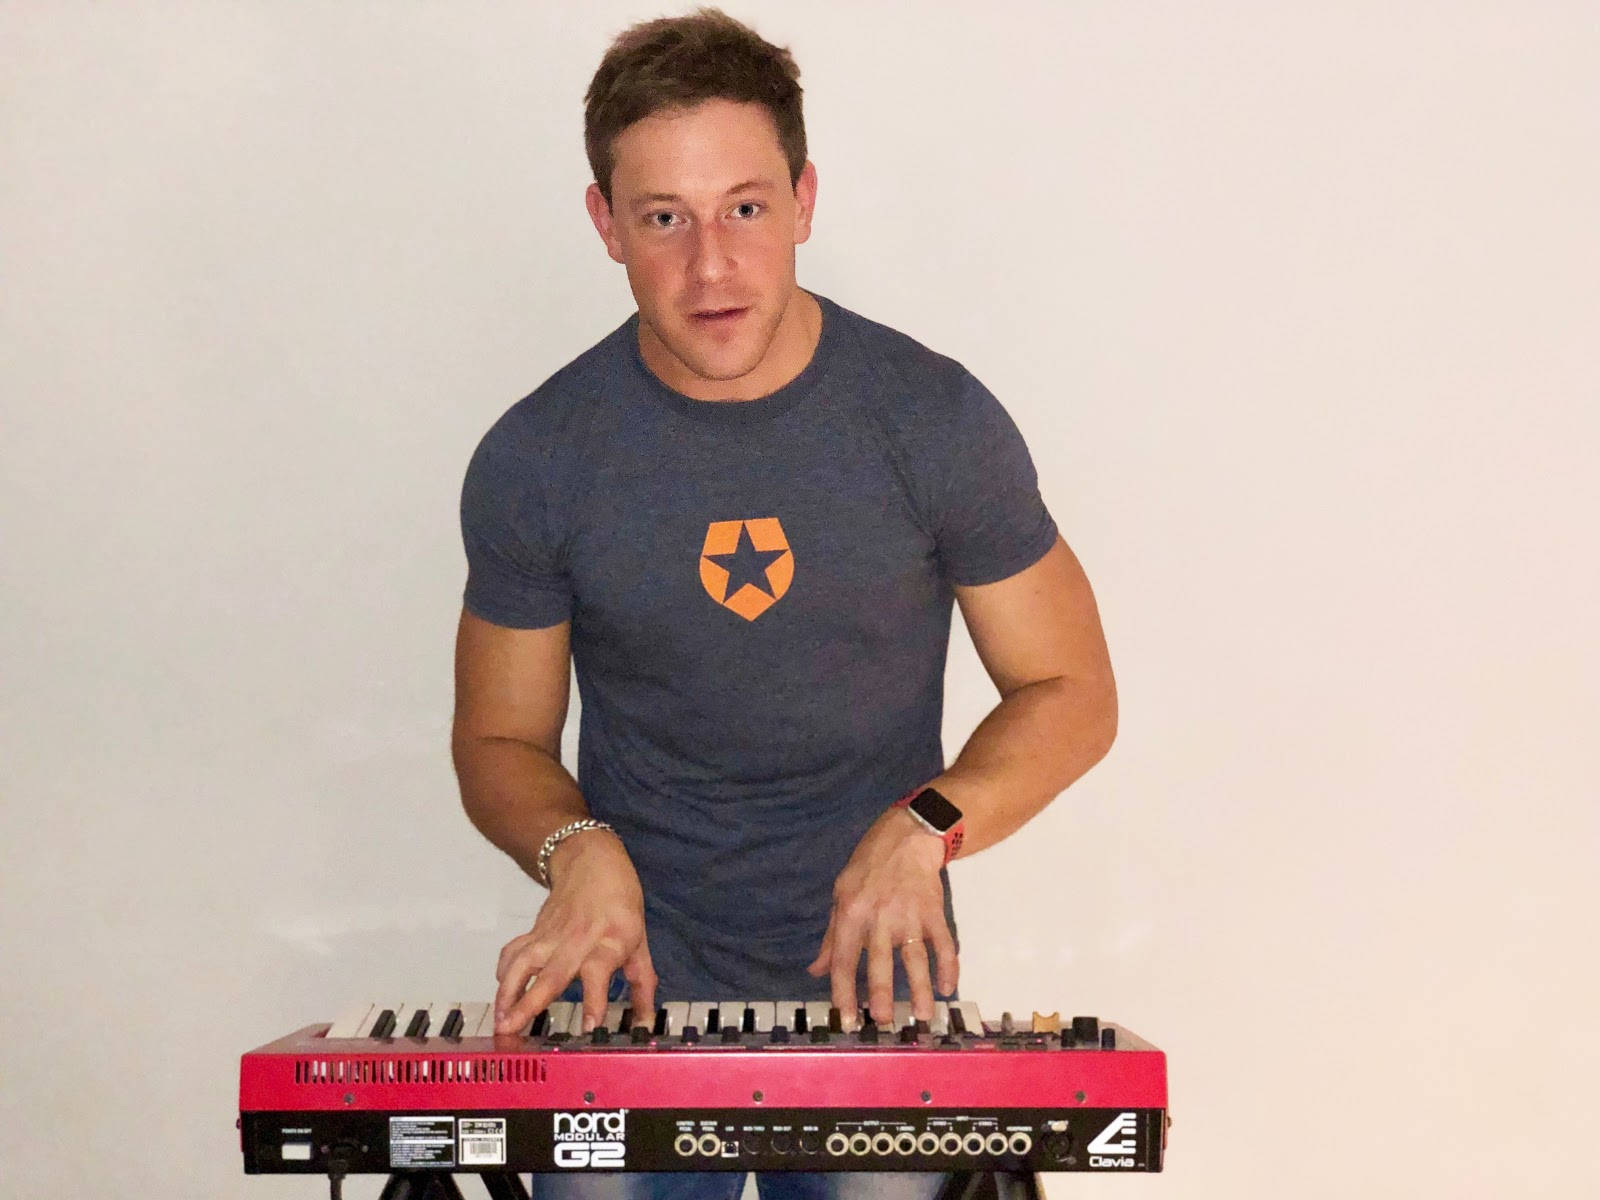 Auth0 Customer Success Architect Julian Lywood-Mulcock playing piano